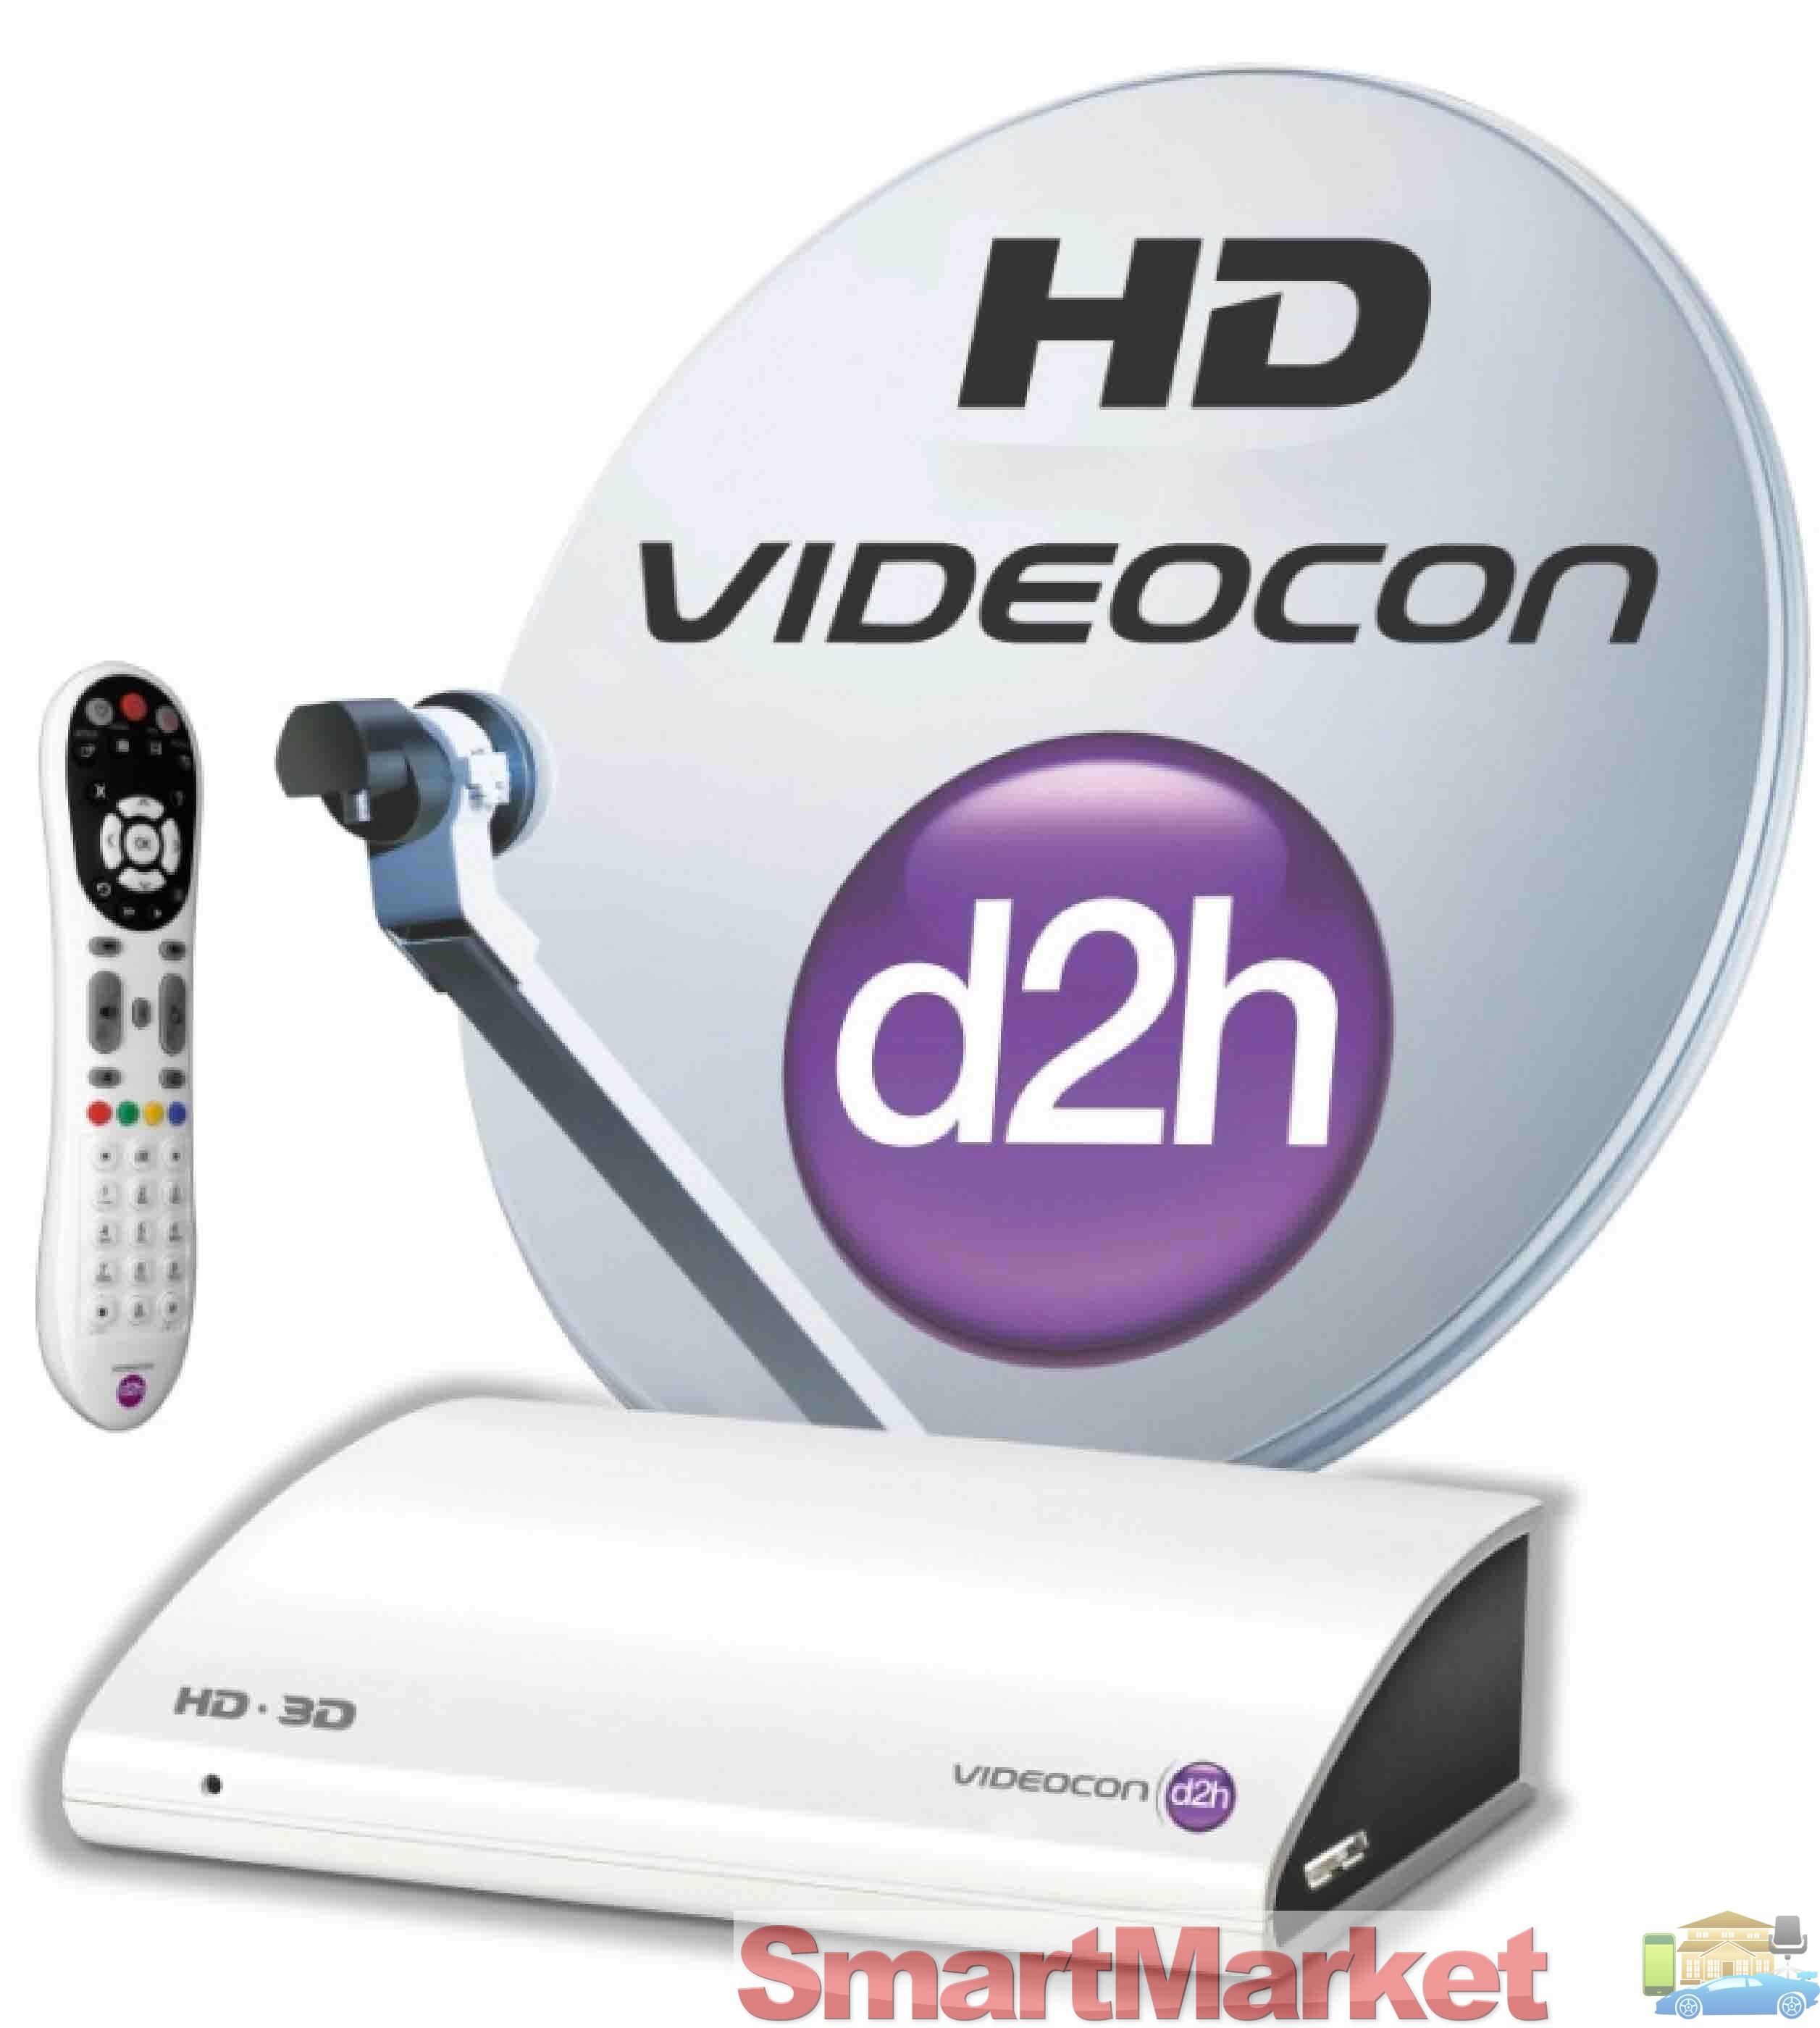 Videocon d2h recharge discount coupon